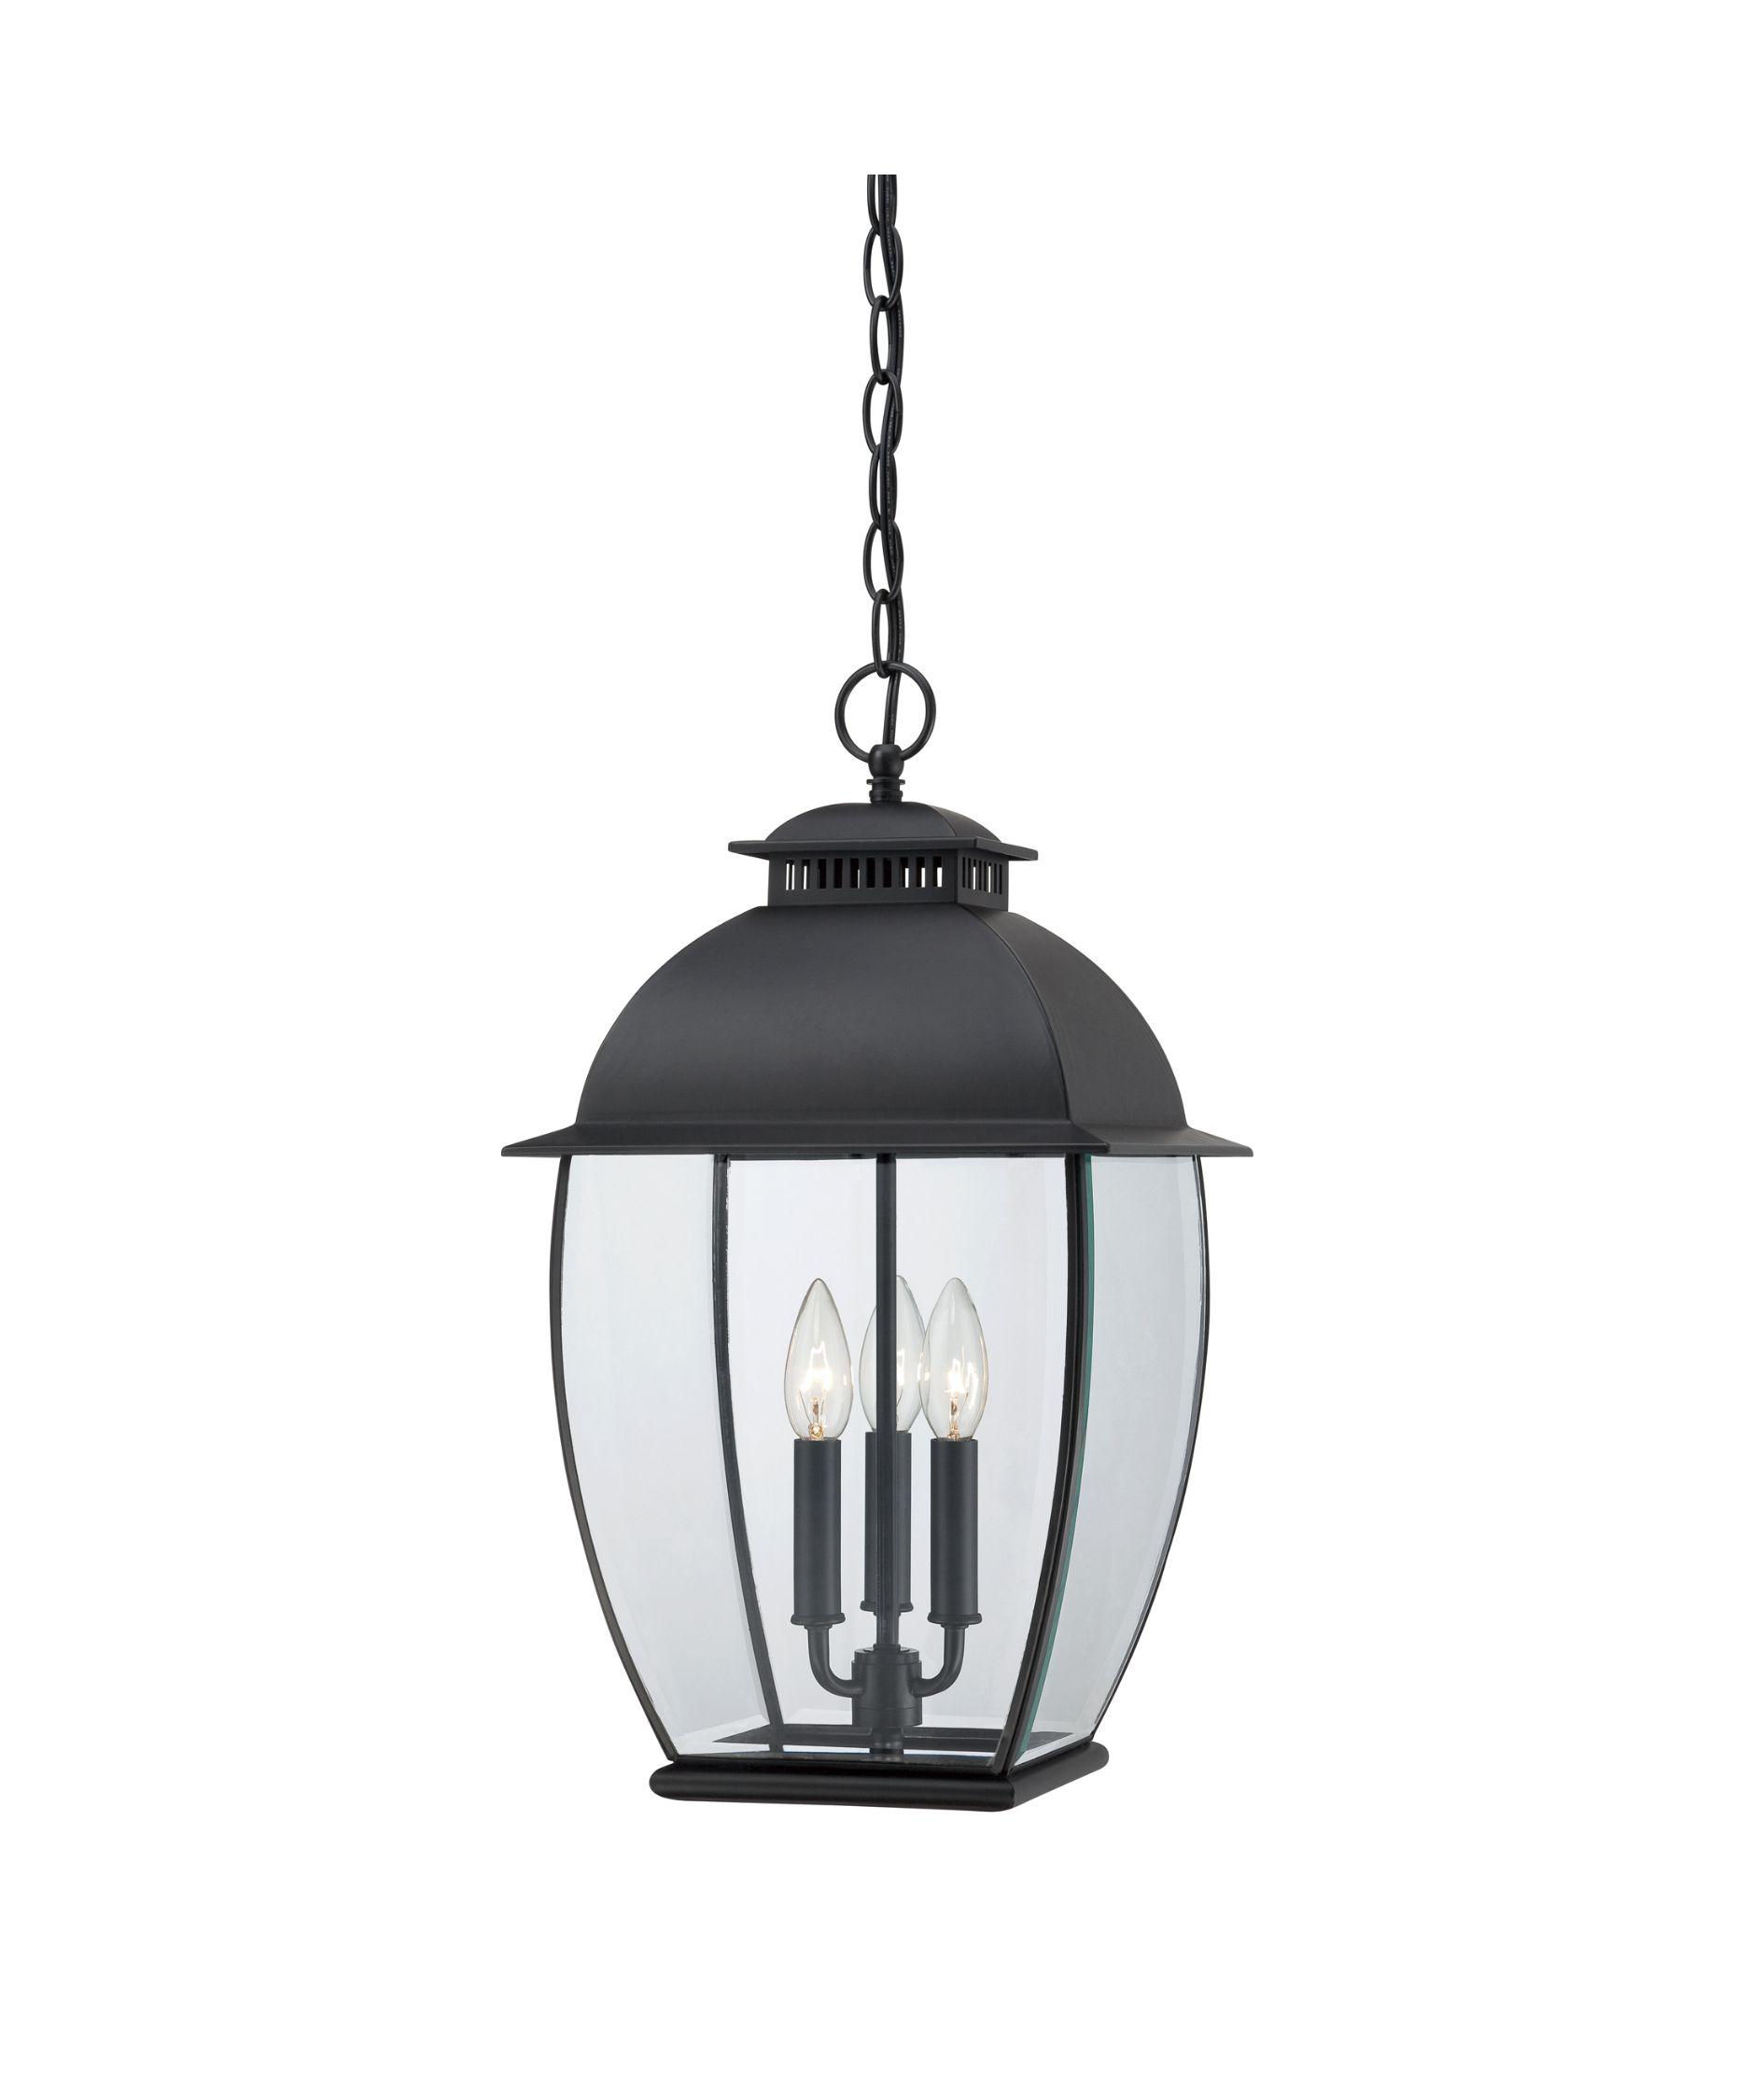 "Quoizel BAN1911 Bain 3 Light Outdoor Hanging Lantern | Capitol Lighting 1-800lighting.com 20.5""  dry locations"